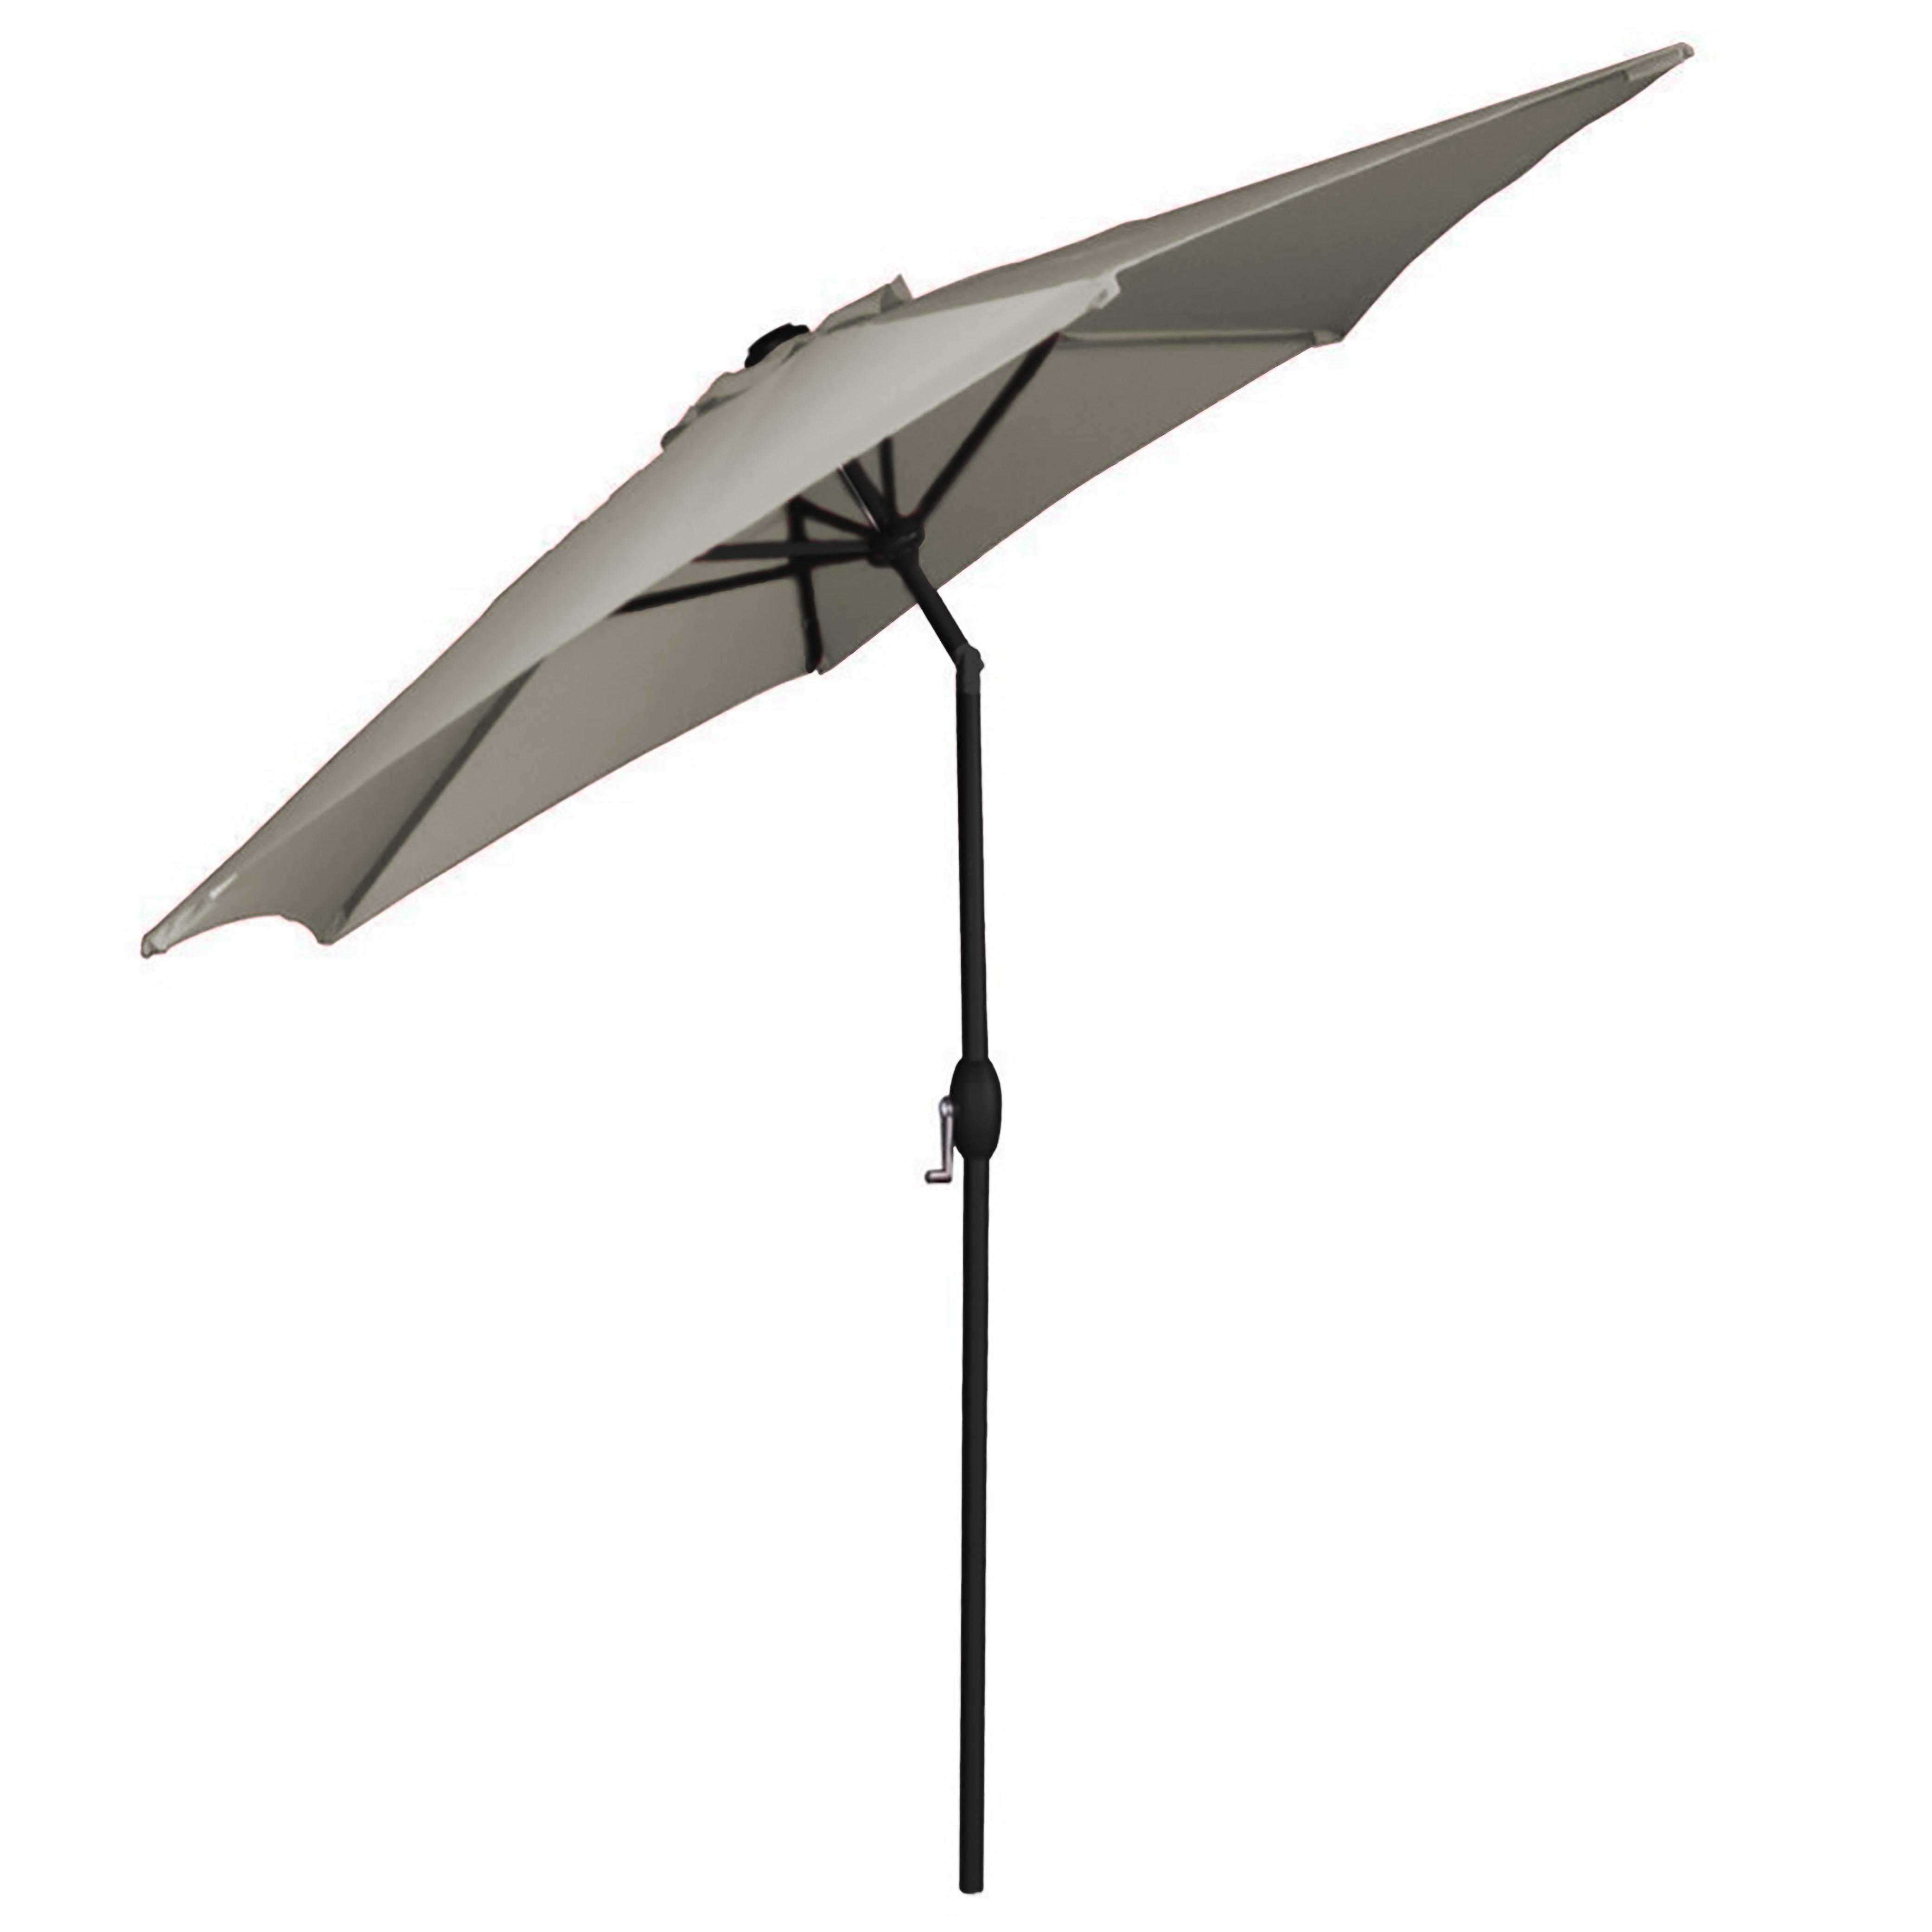 Panama Market Umbrella Intended For Trendy Belles Market Umbrellas (View 13 of 20)